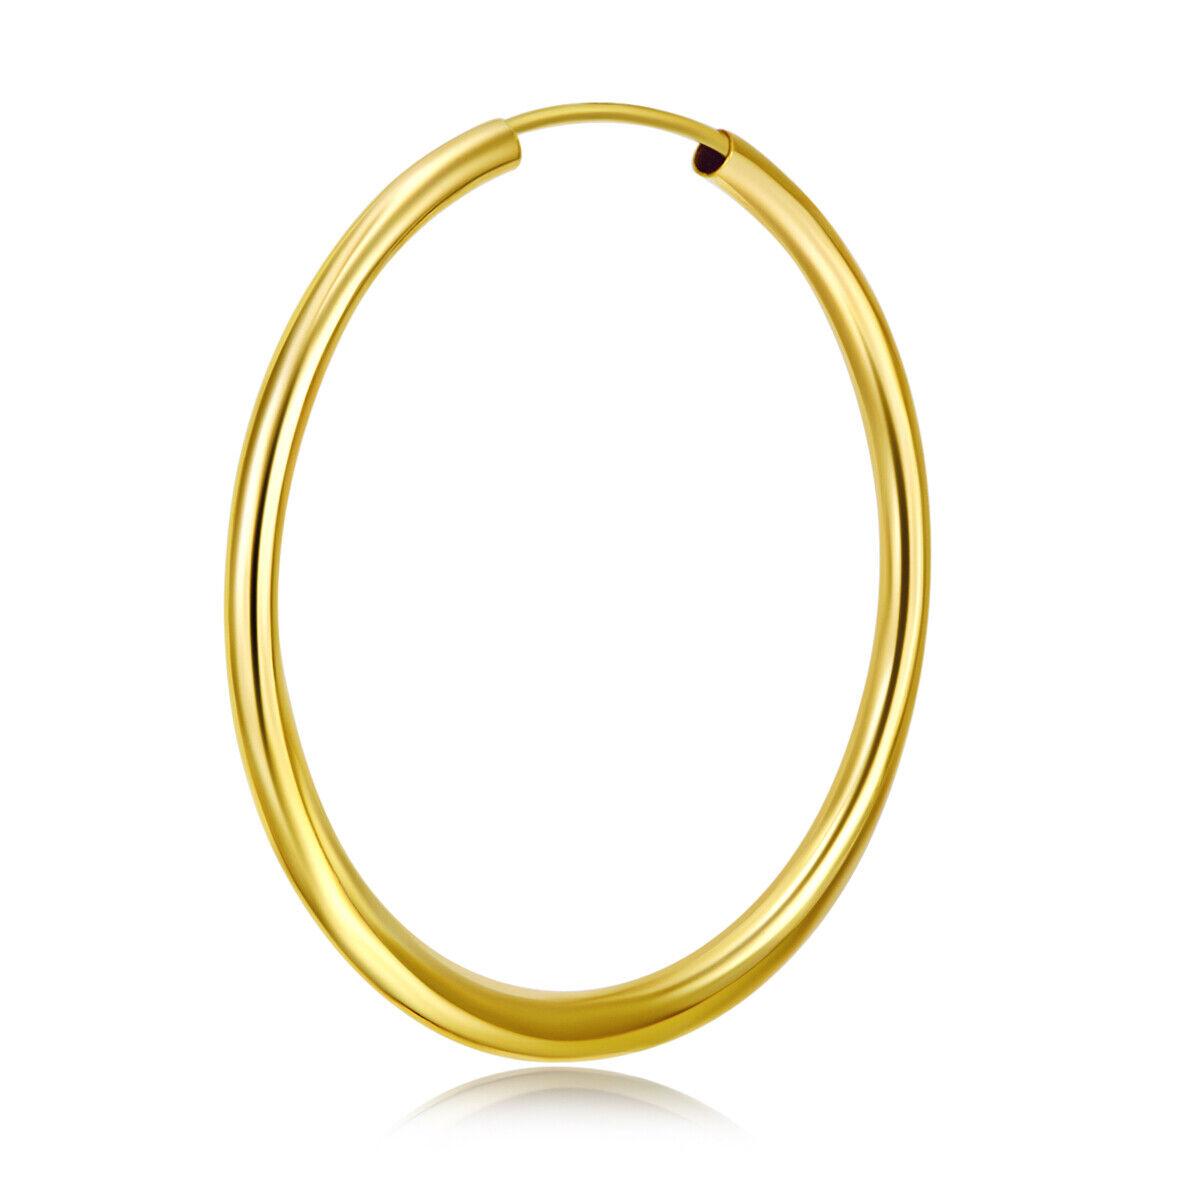 14K Solid Yellow Gold Classic Endless Hoop Earrings ER-HE12